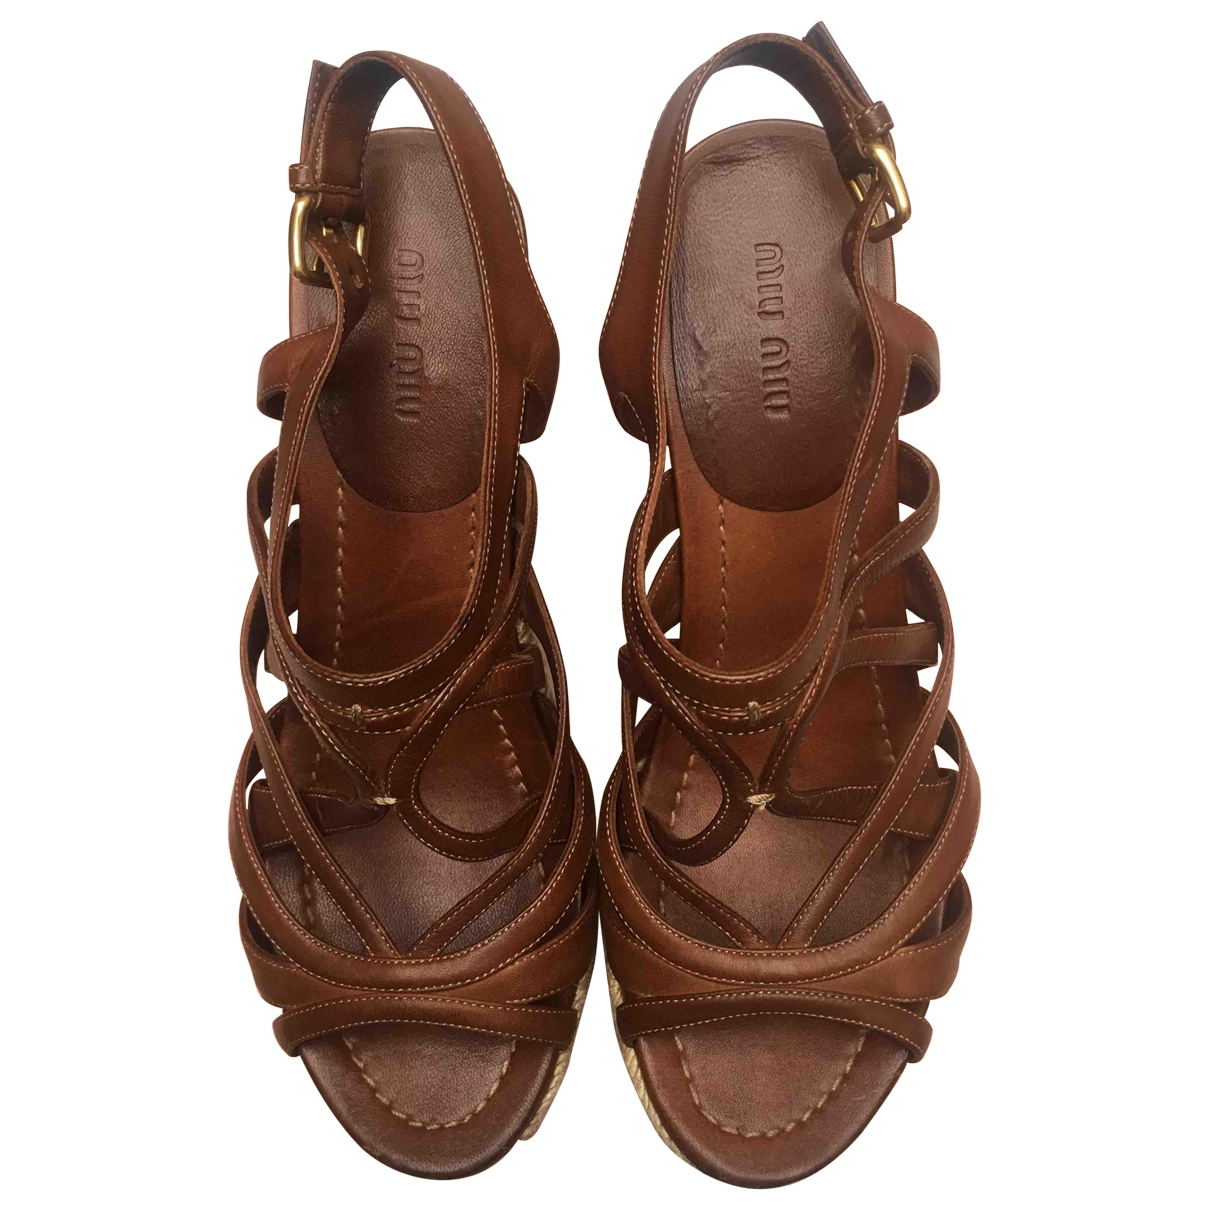 Miu Miu \N Camel Leather Espadrilles for Women 39.5 EU